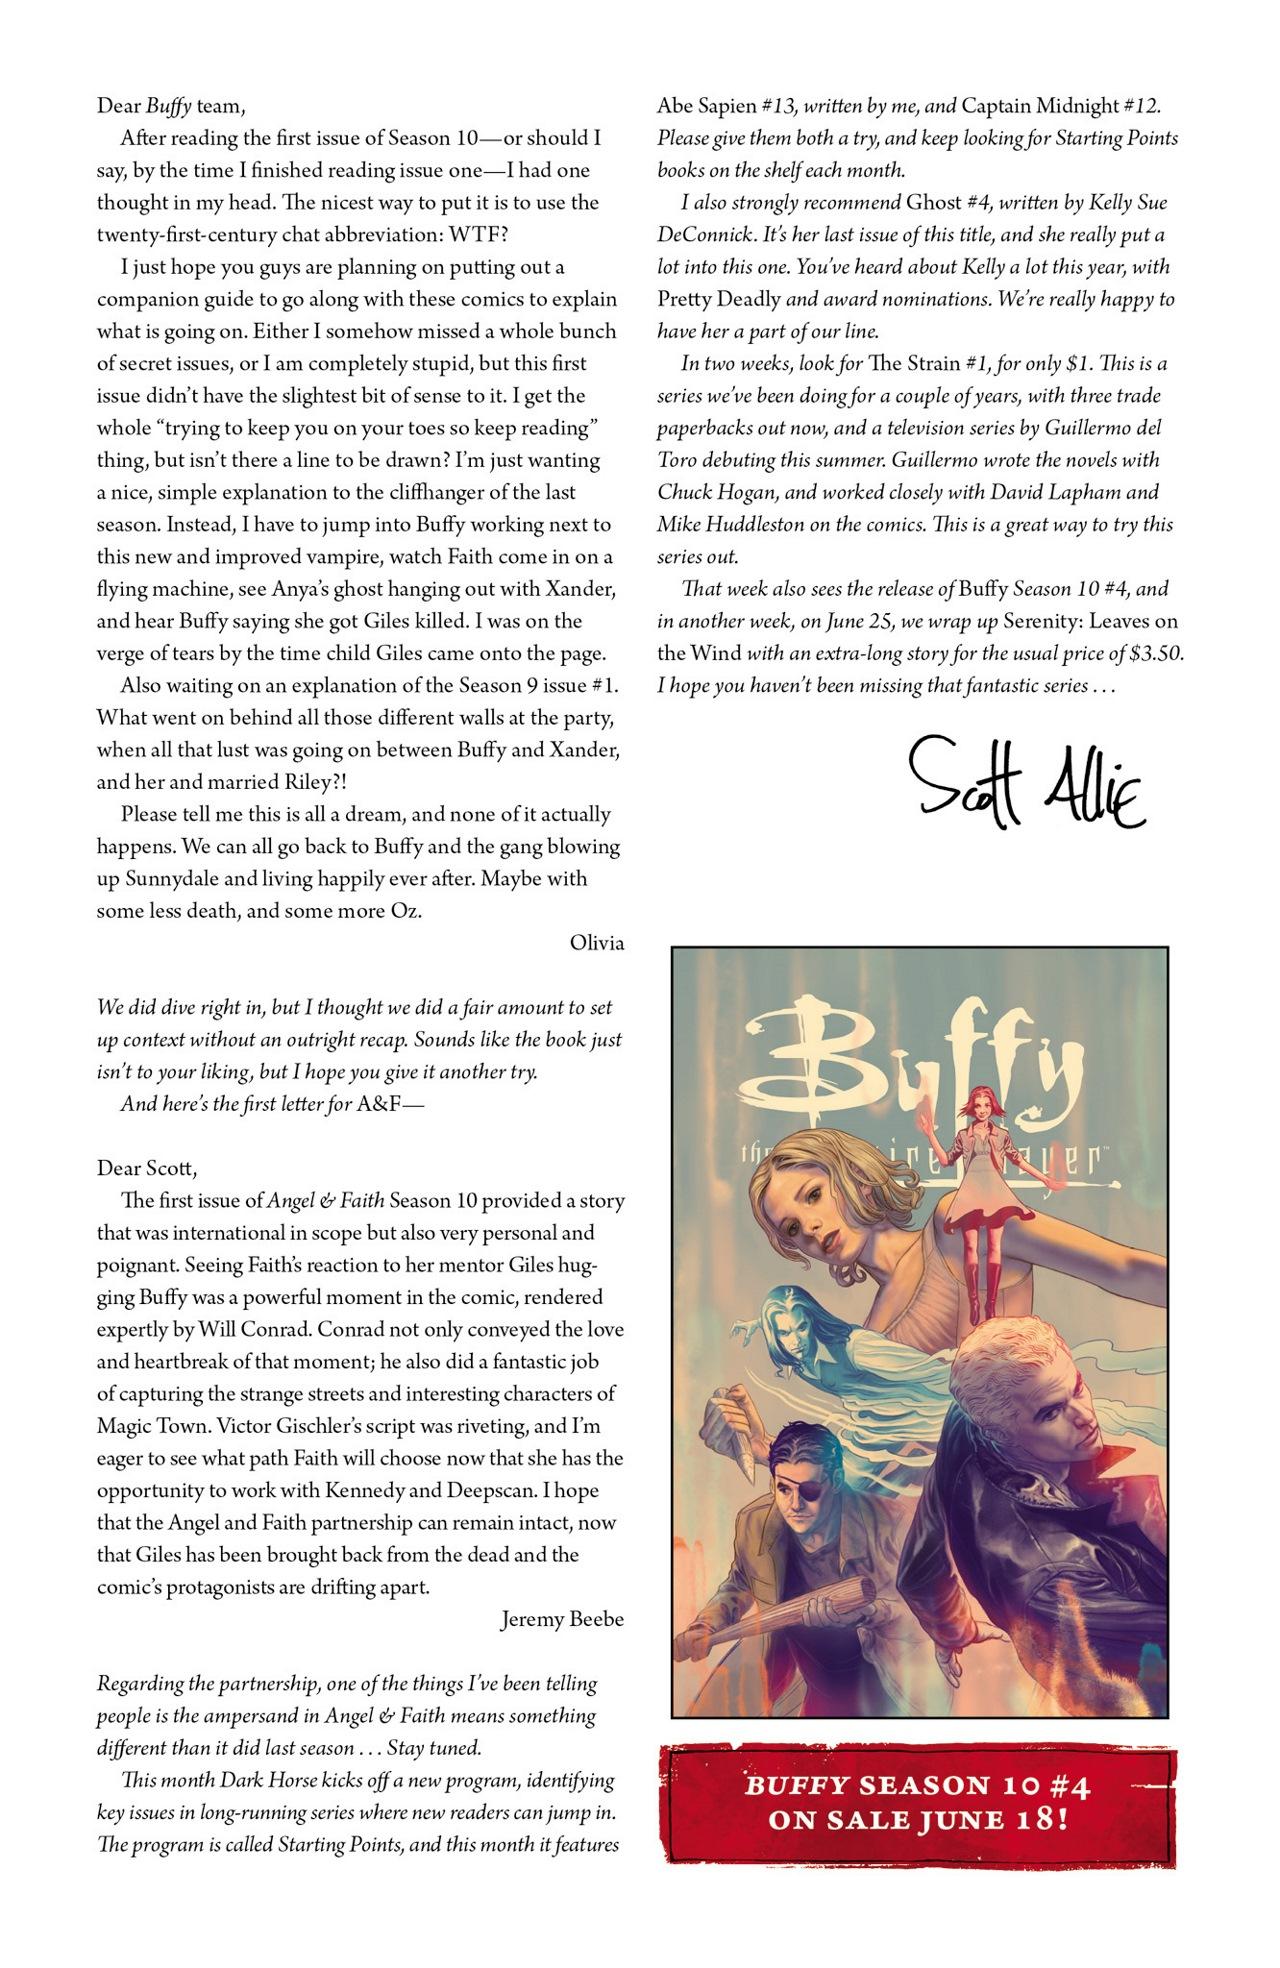 Read online Angel & Faith Season 10 comic -  Issue #3 - 26